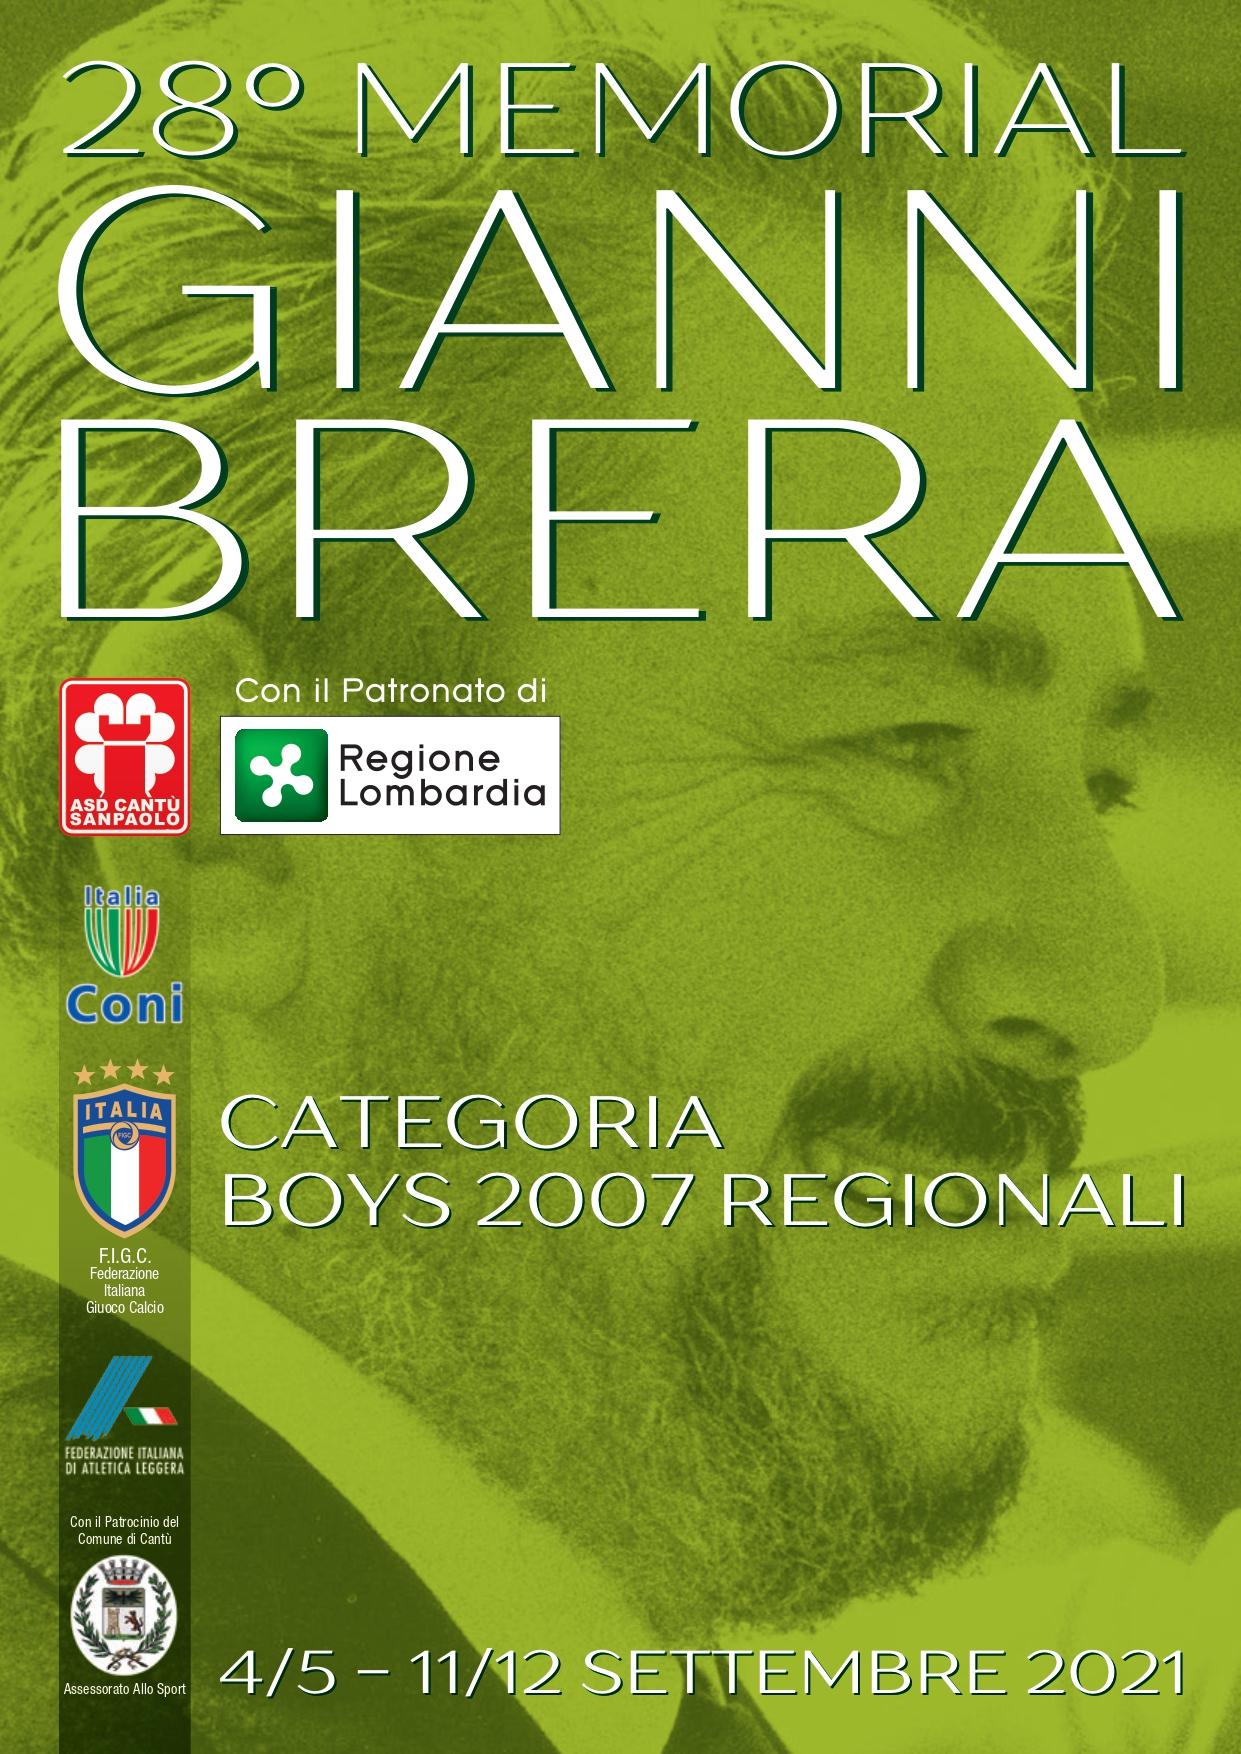 AC_CANTU_brochure_GIANNI_BRERA_2021 (1)-1 (2)_page-0001